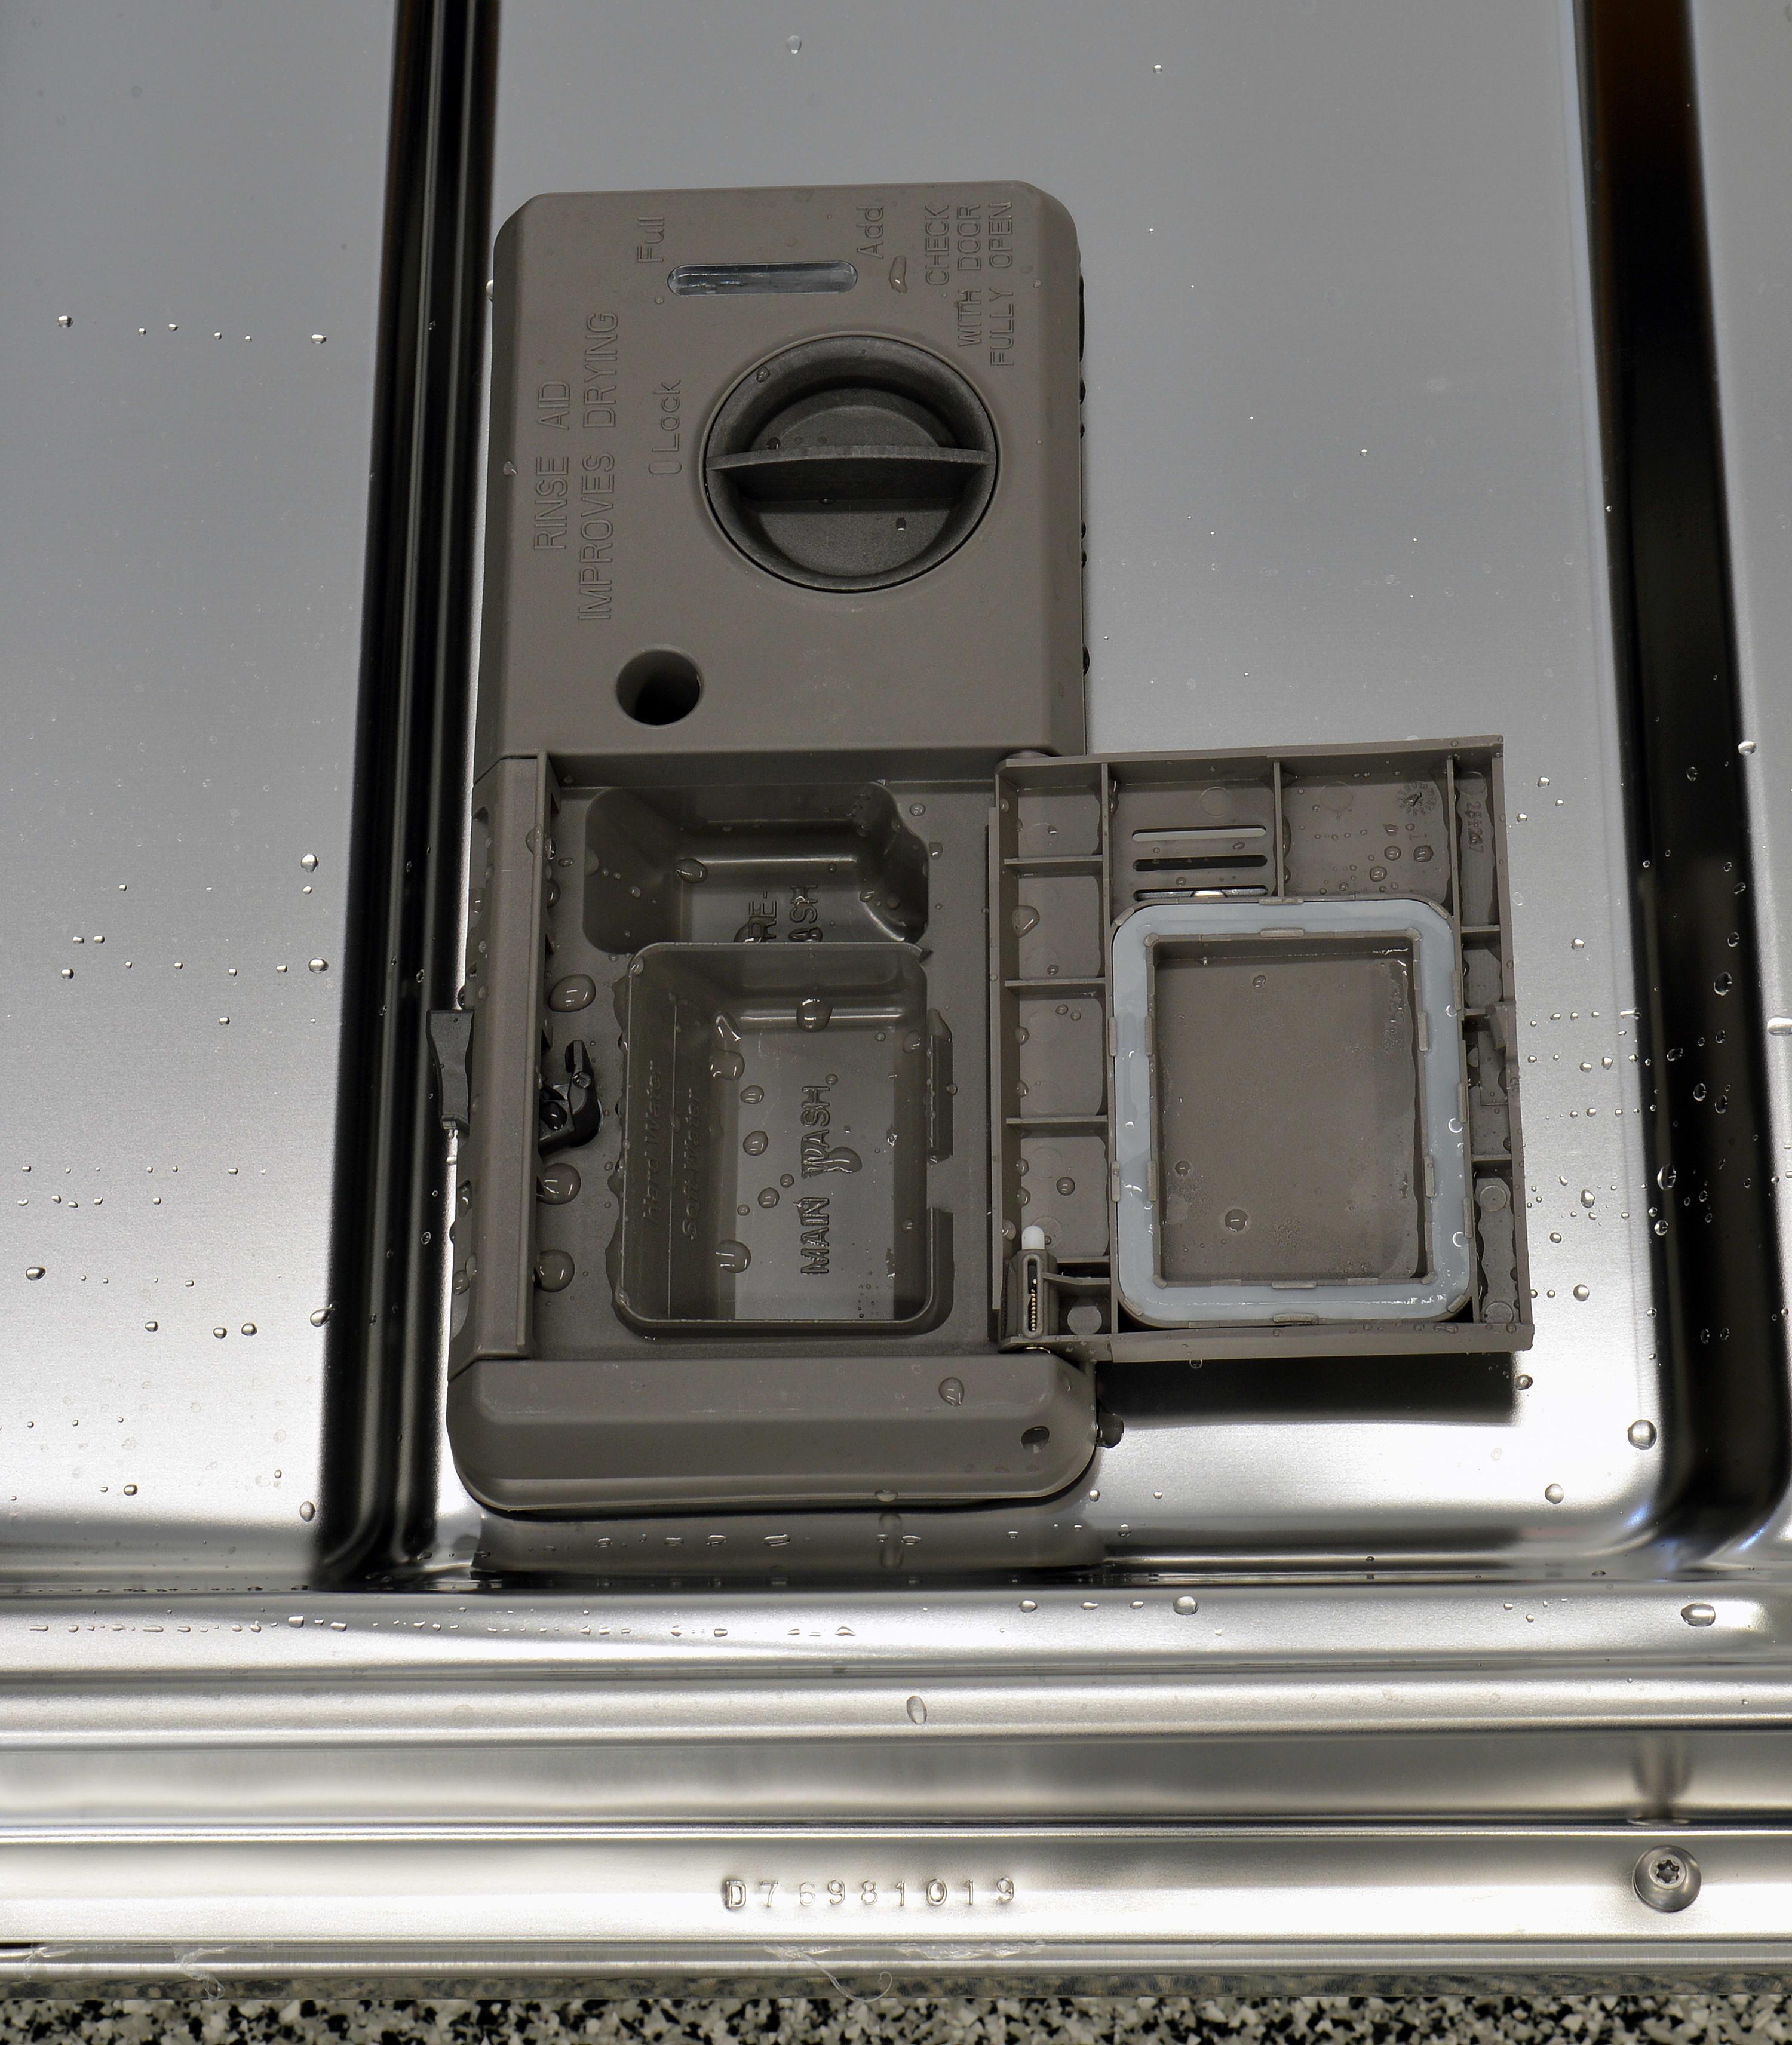 Maytag MDB4949SDM detergent and rinse aid dispenser